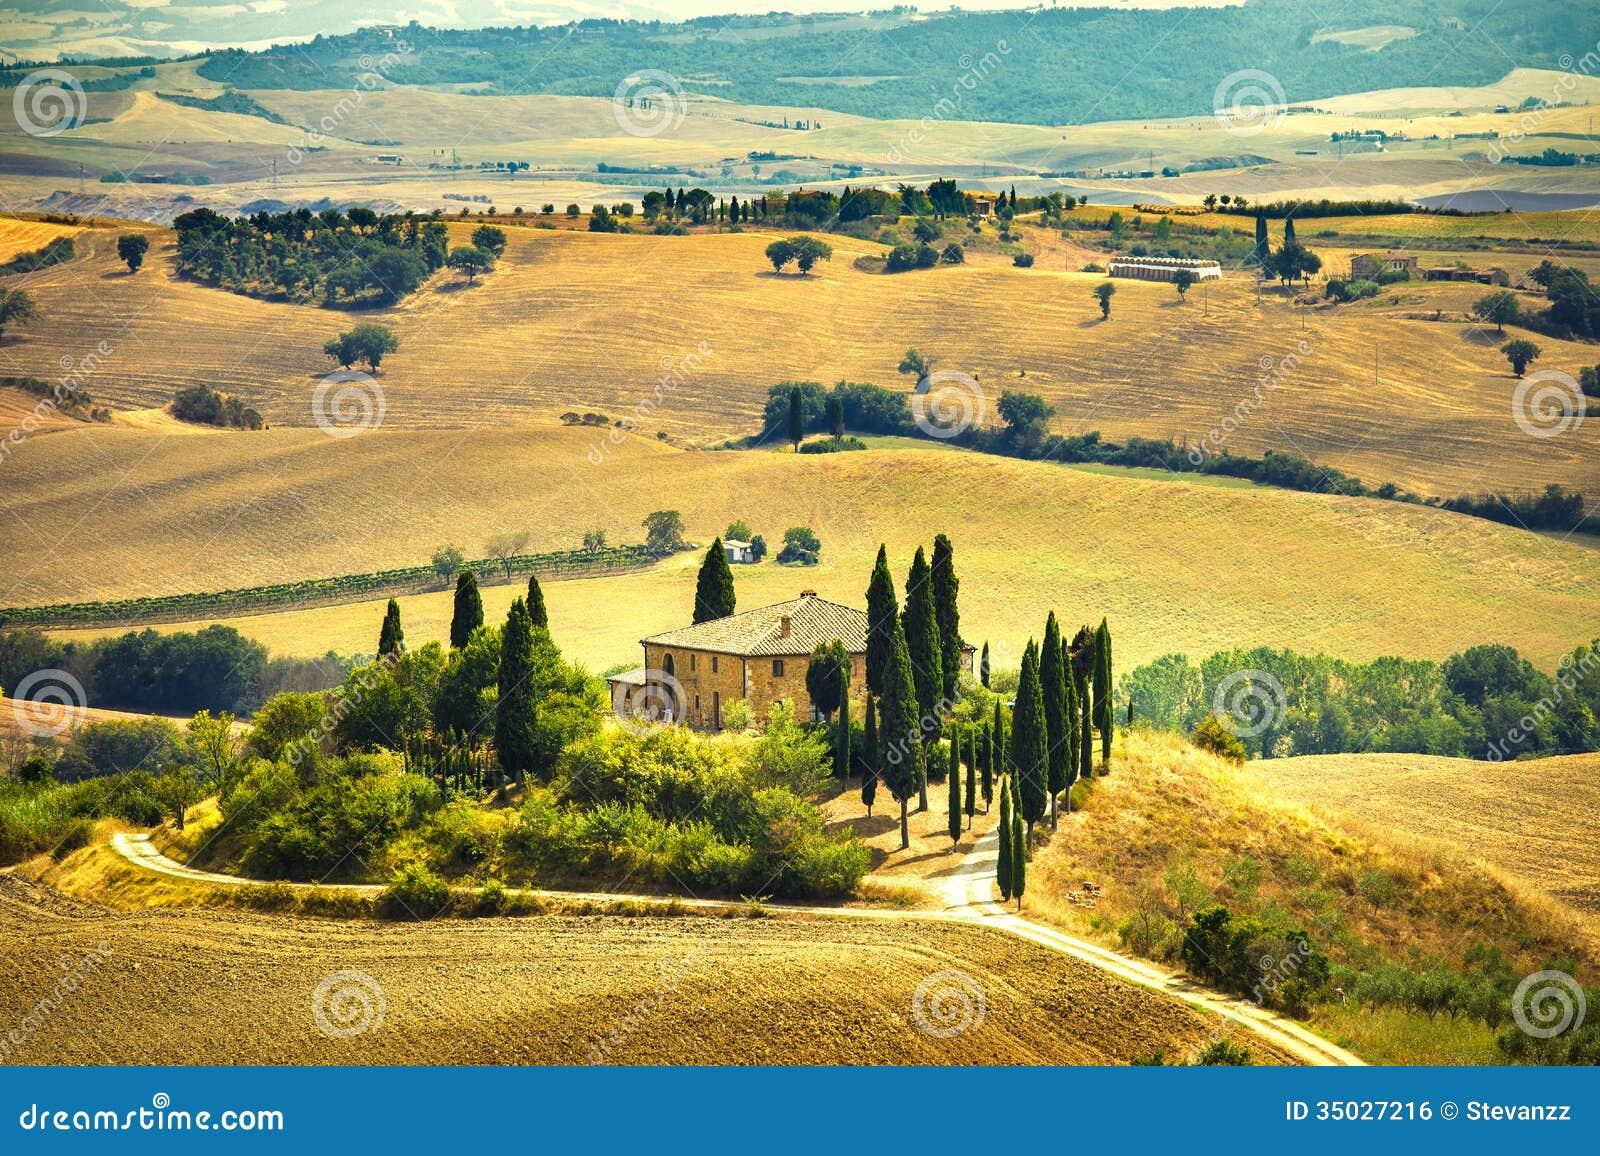 Tuscany farmland and cypress trees green fields san for Green italy